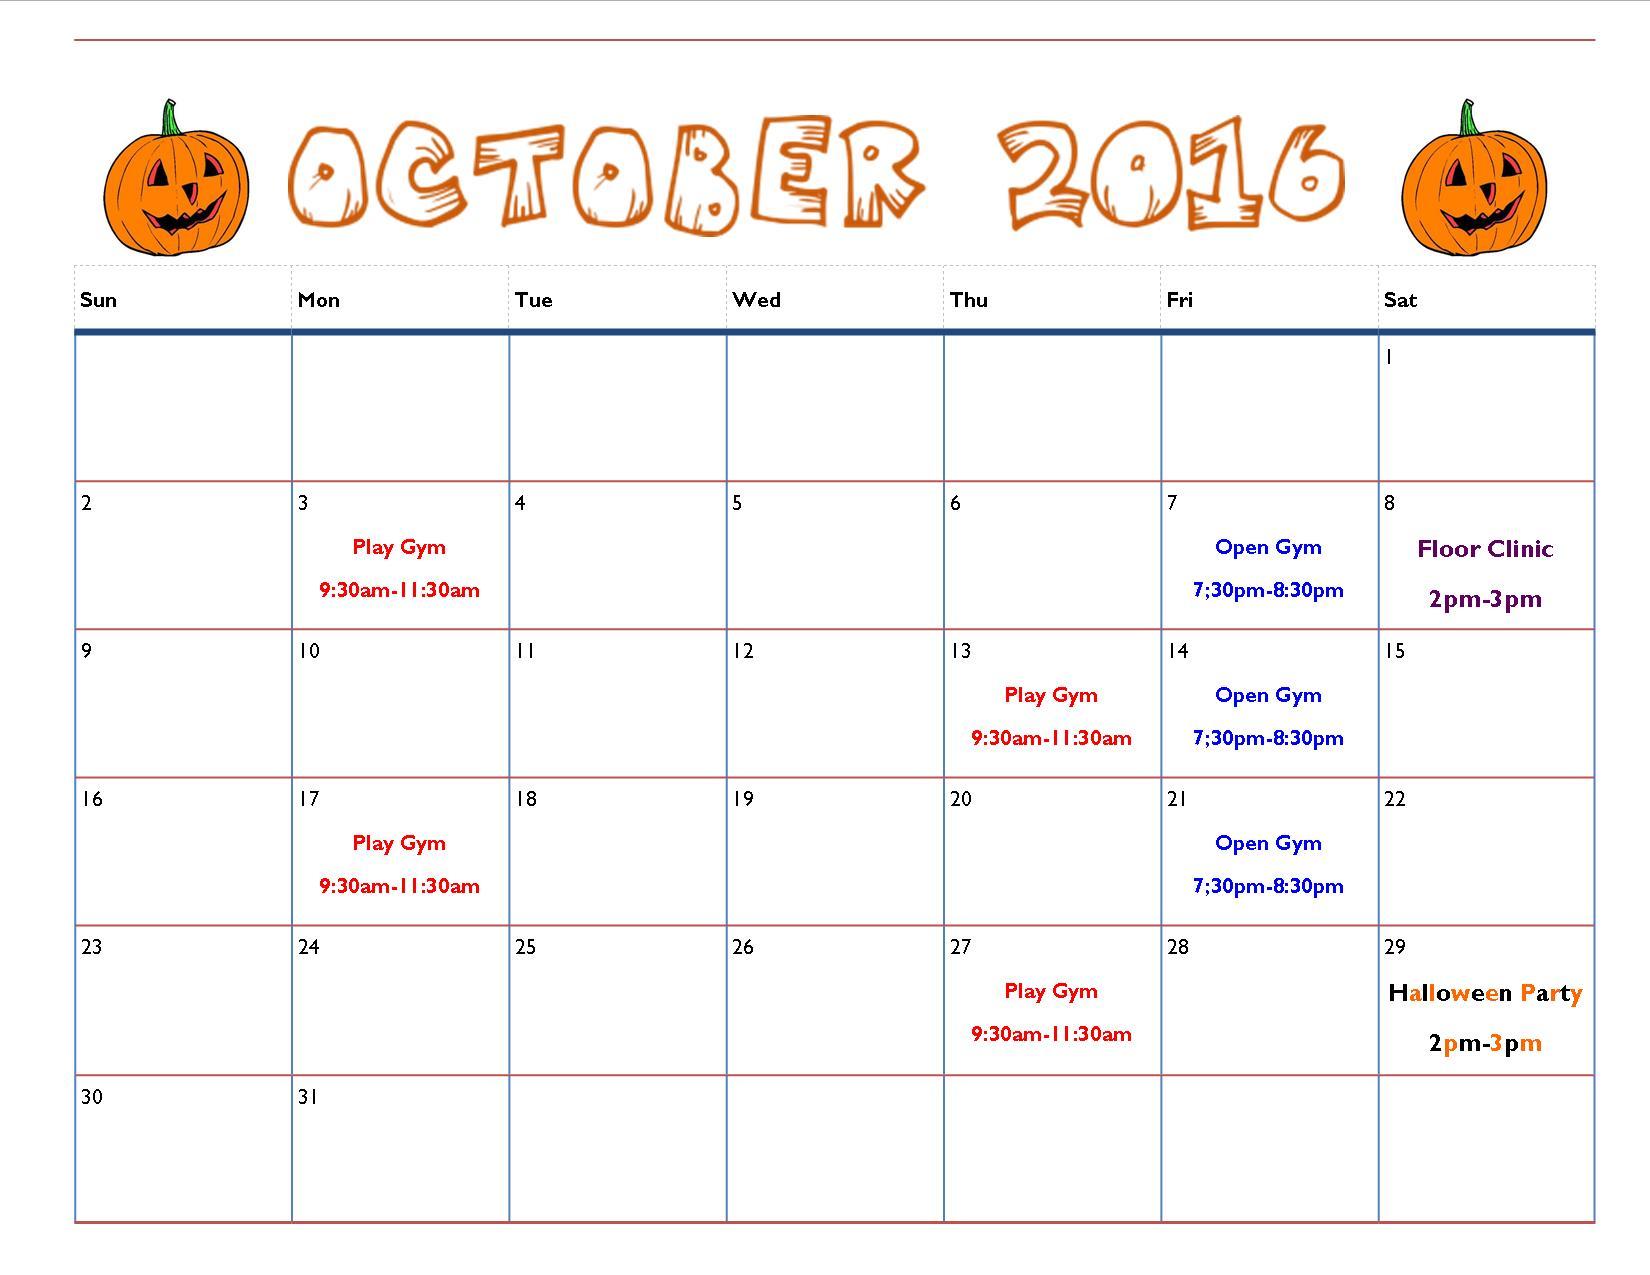 Schenectady Rotterdam 2016 October Gymnastics Calendar